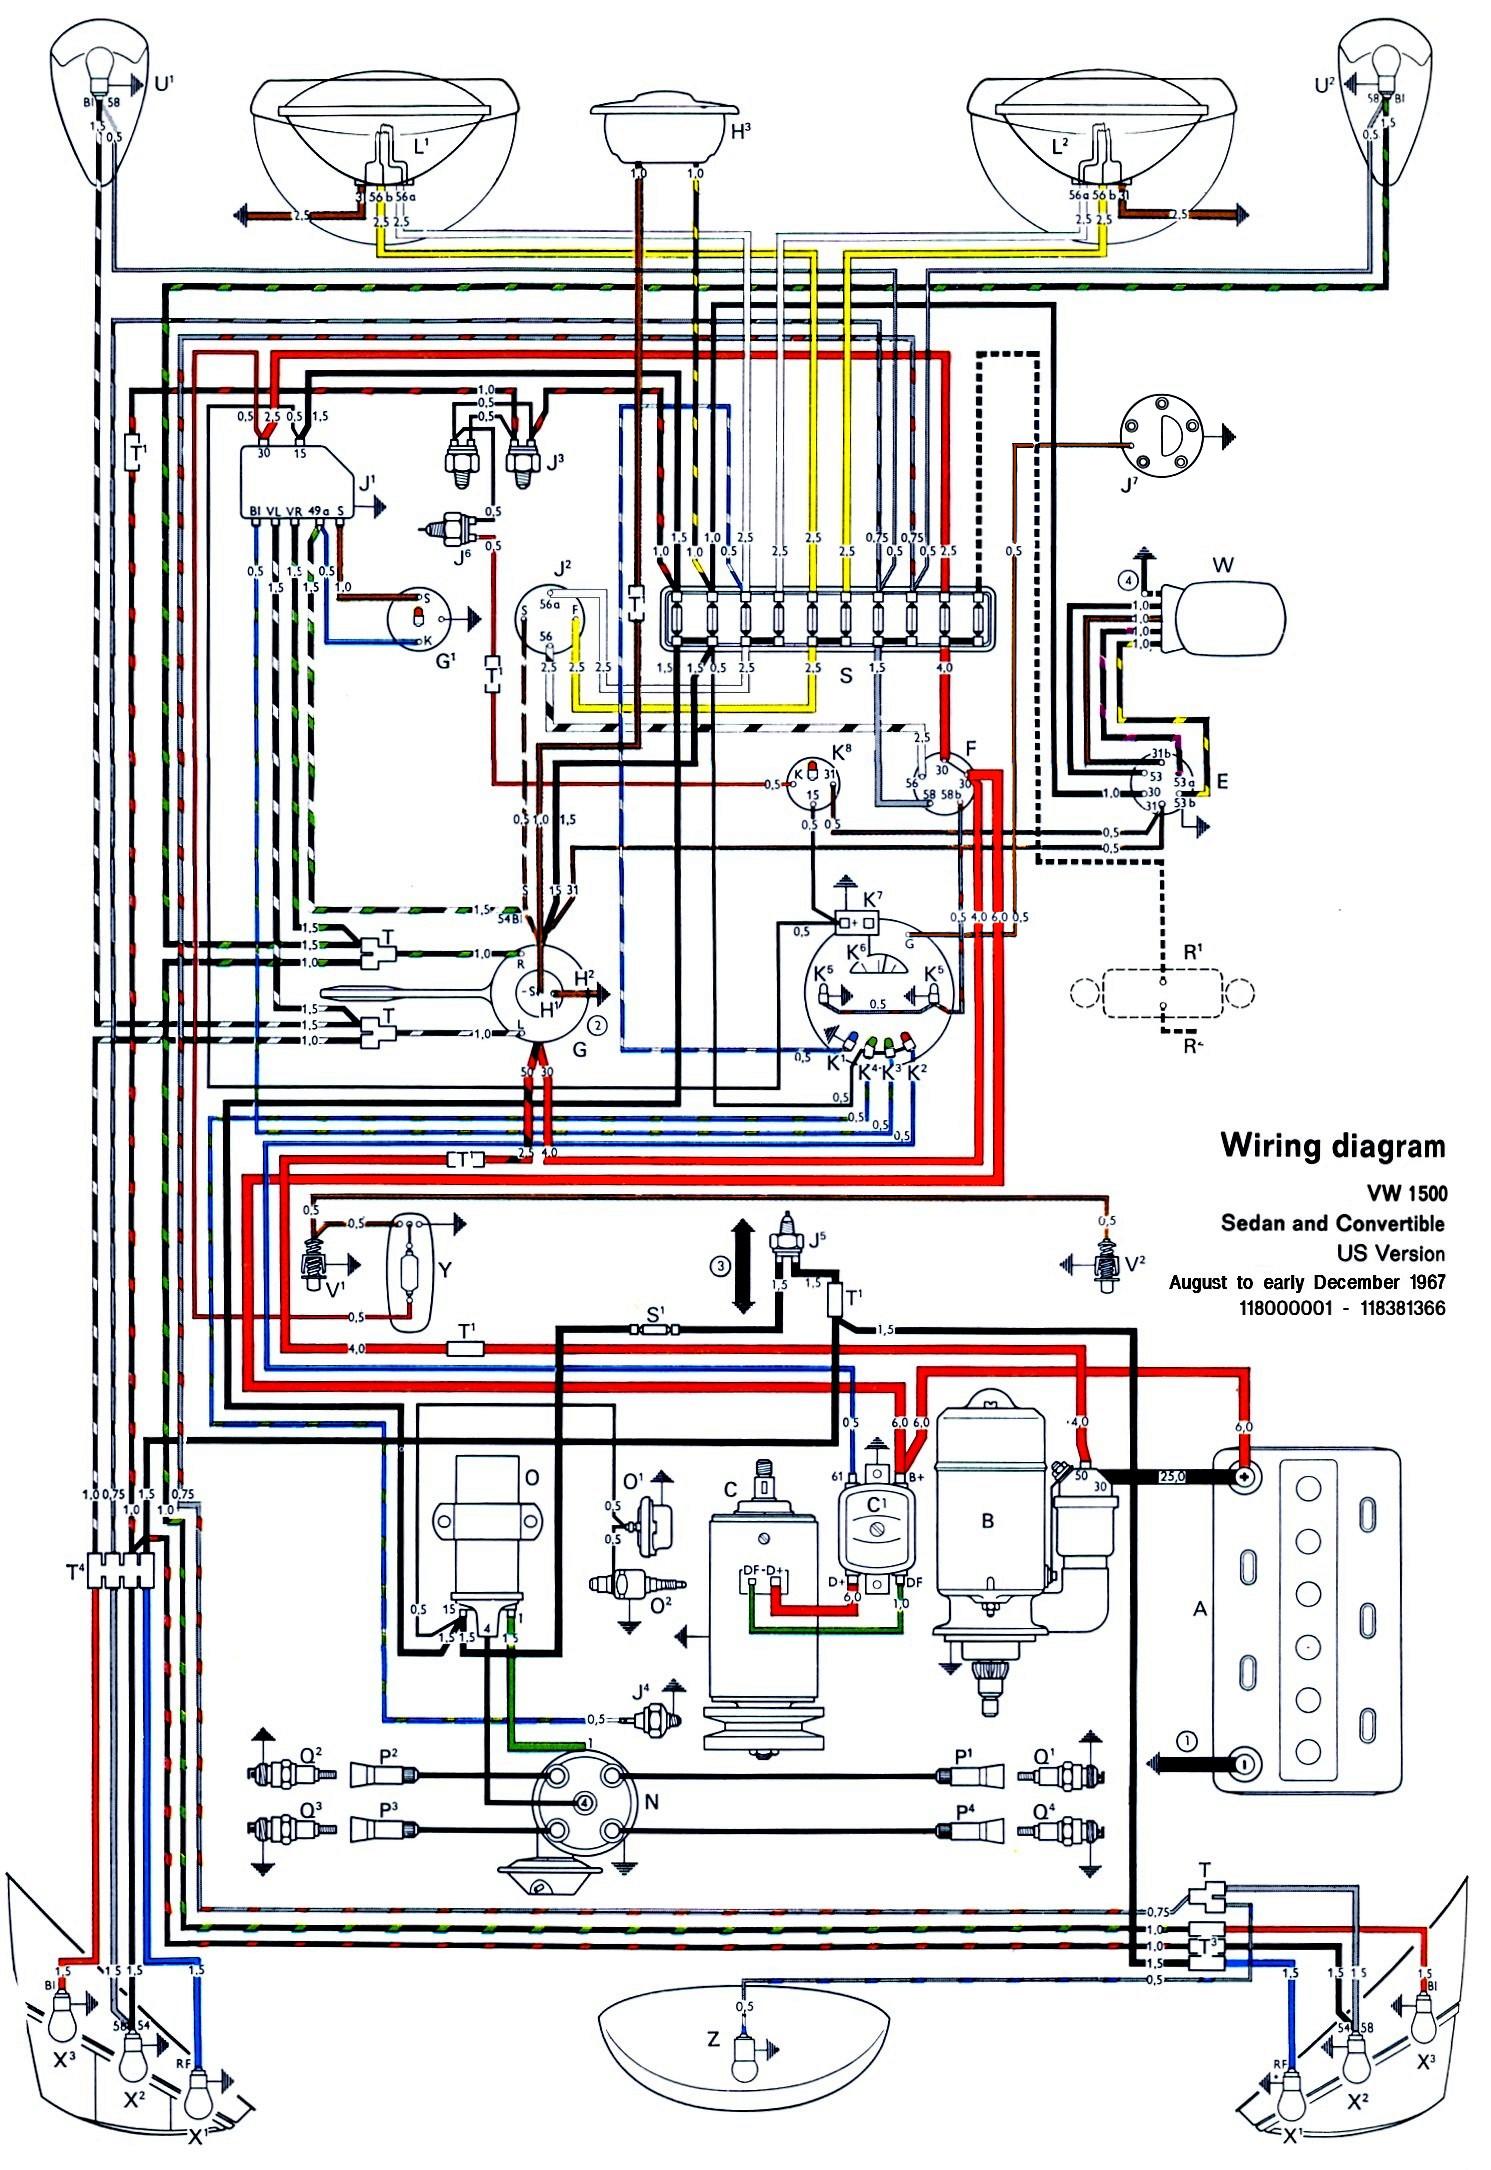 Enjoyable Easy Wiring Harness Vw Air Cooled Wiring Diagram Wiring Cloud Onicaxeromohammedshrineorg